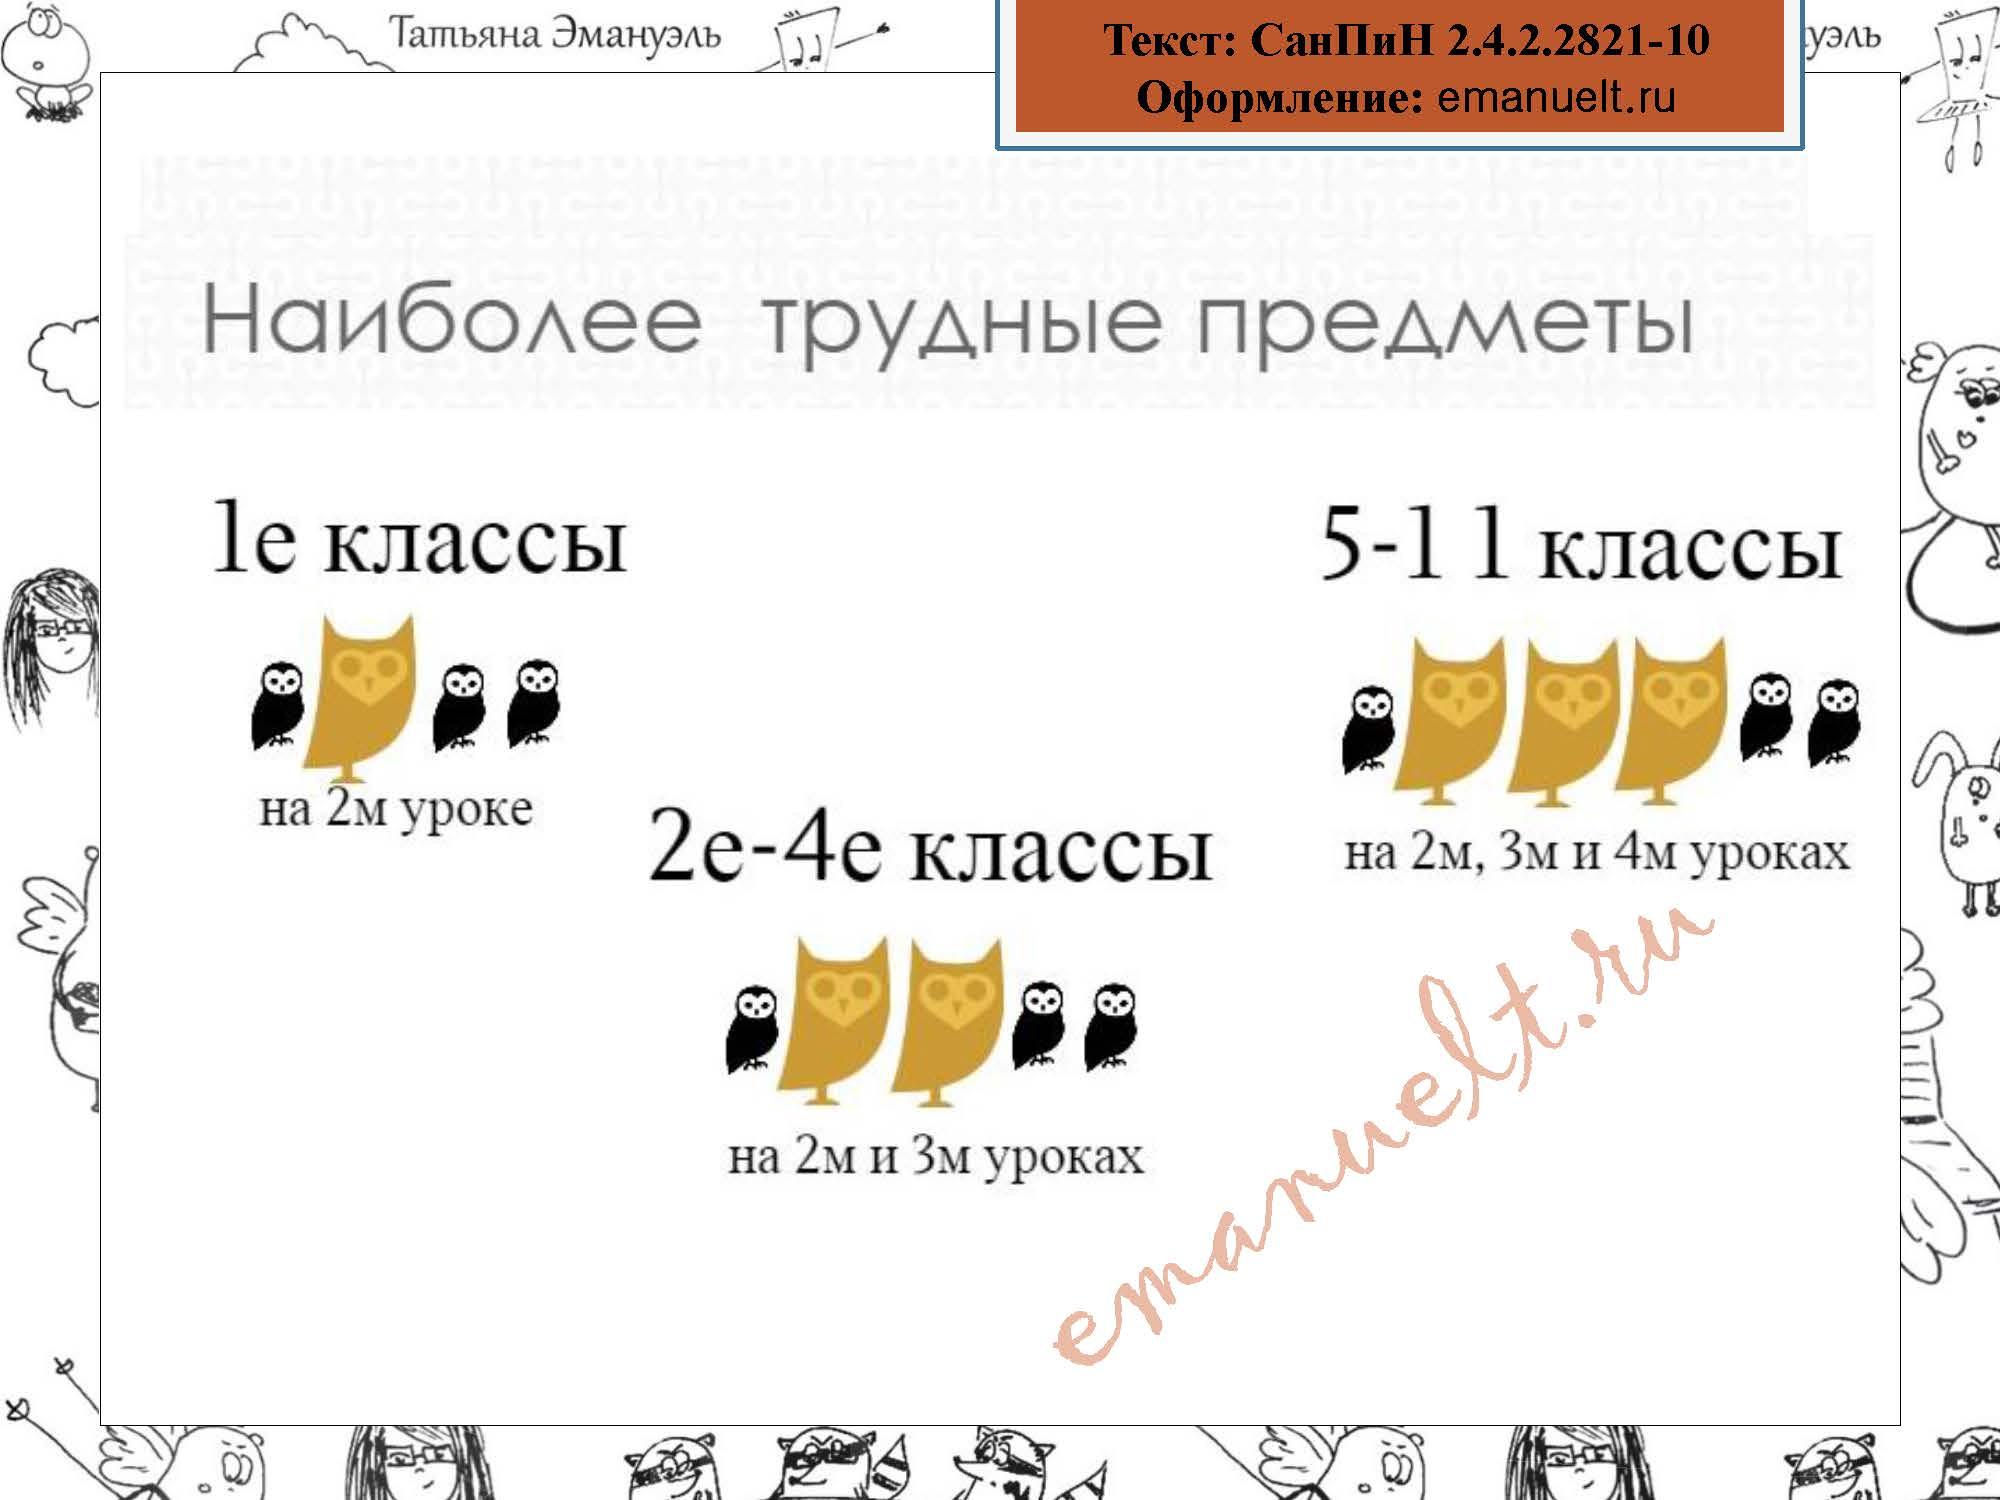 санпин доп_Страница_04